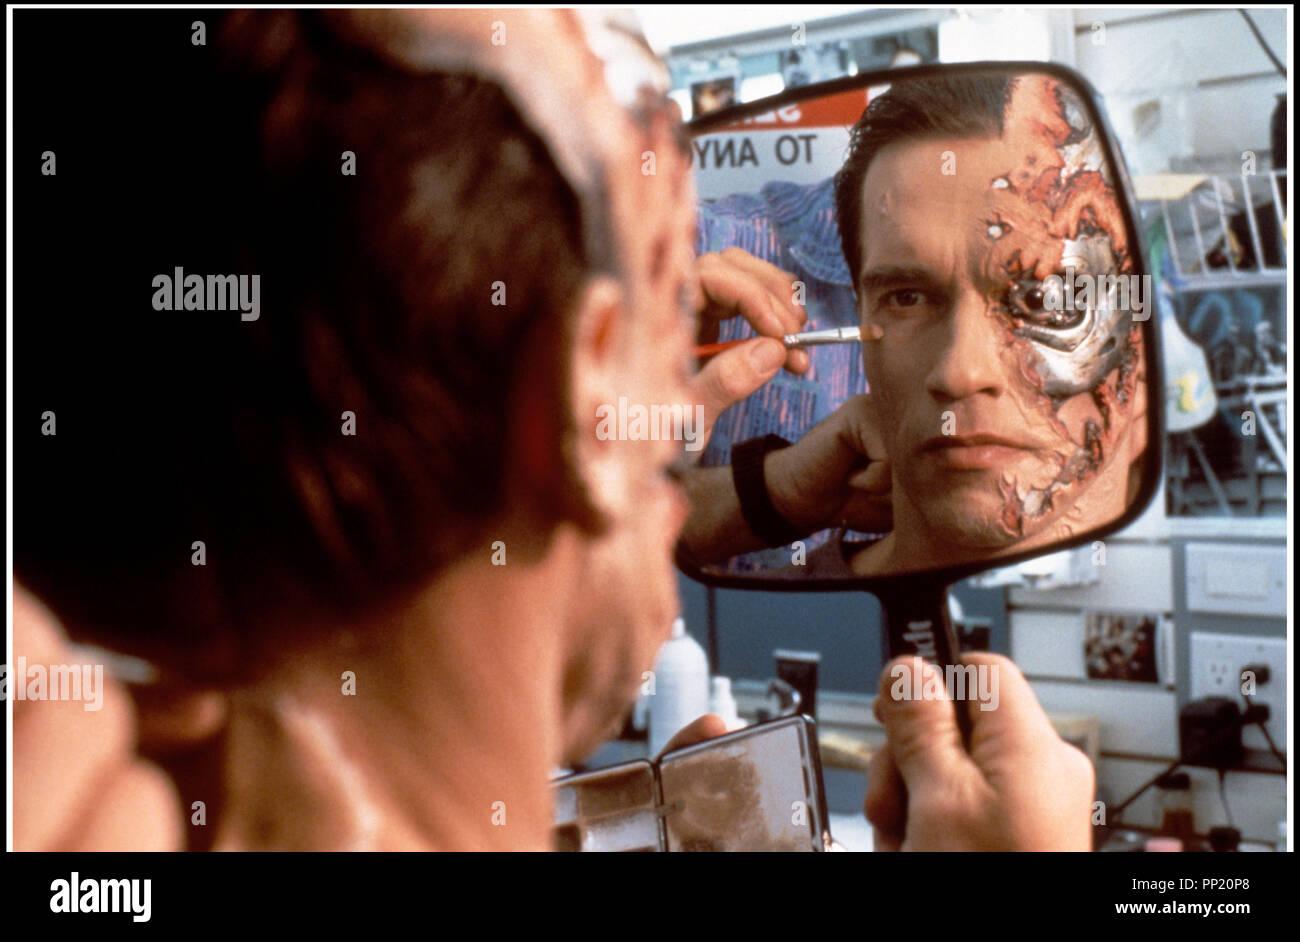 Prod DB © Carolco Pictures / DR TERMINATOR 2 (TERMINATOR 2 : JUDGMENT DAY) de James Cameron 1991 USA avec Arnold Schwarzenegger sur le tournage maquillage - Stock Image